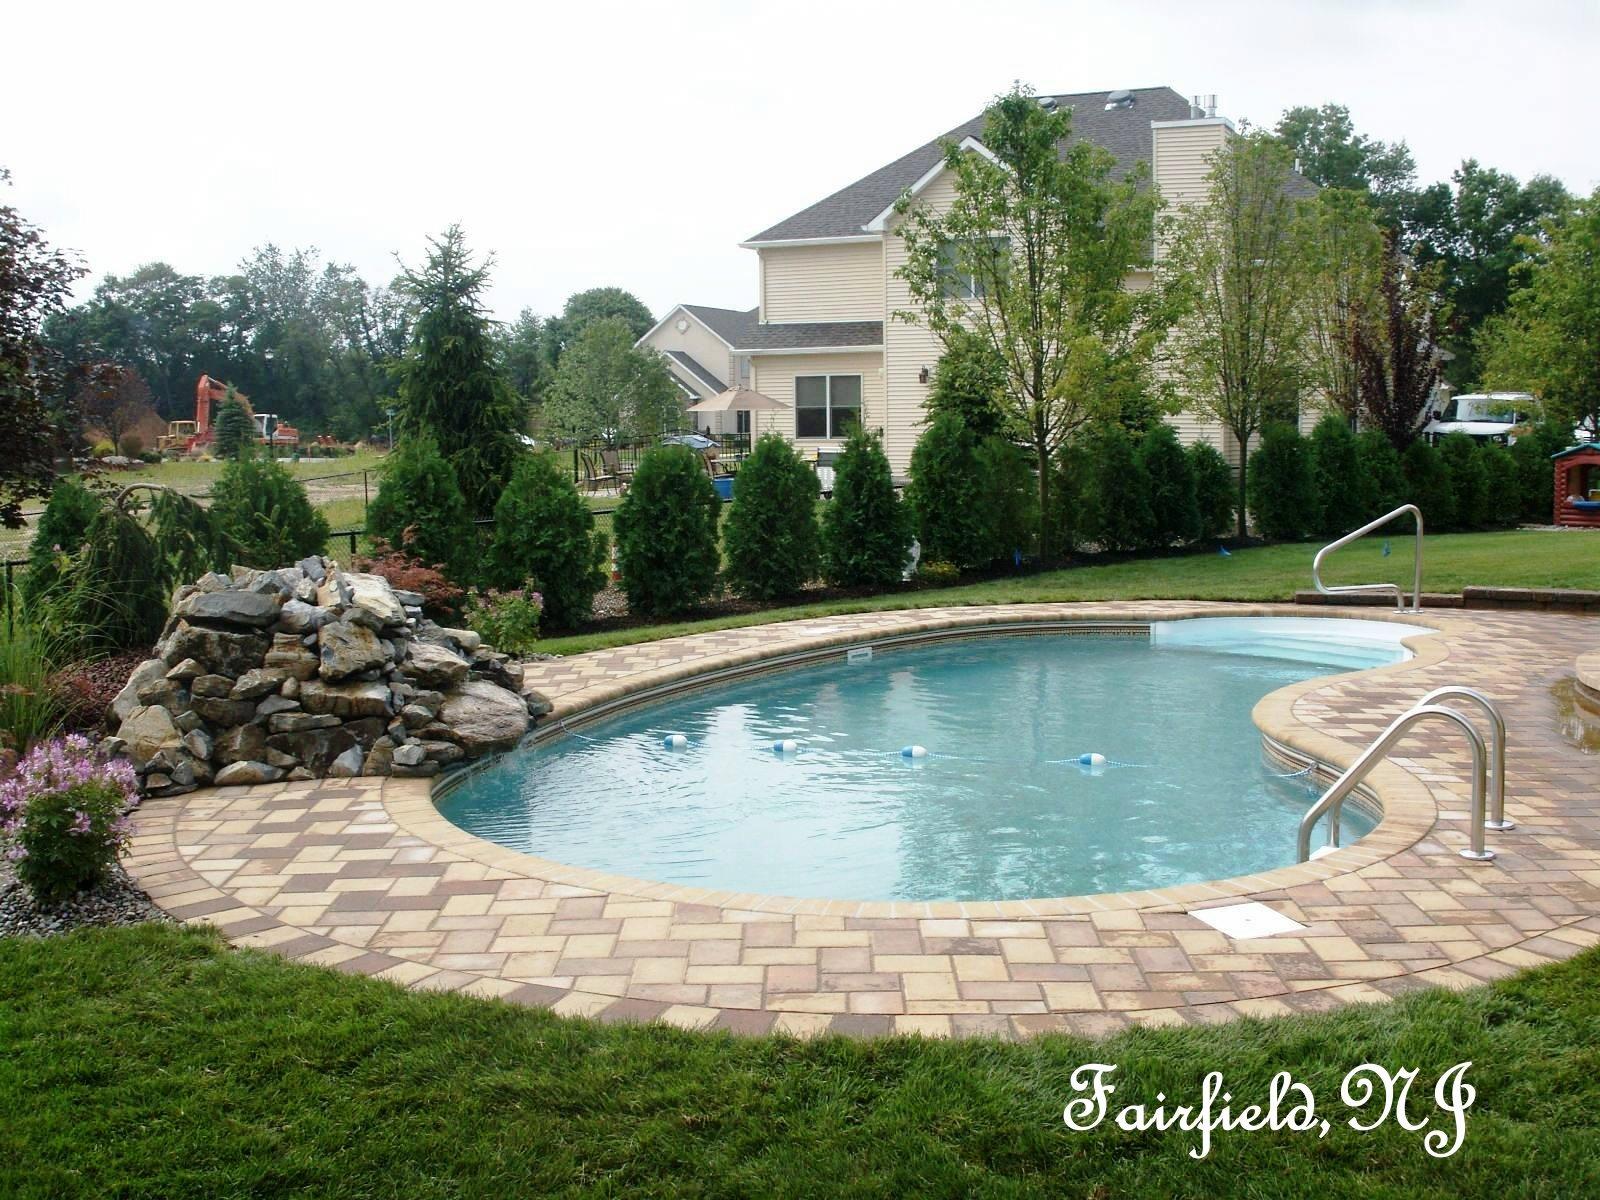 Sangello pool